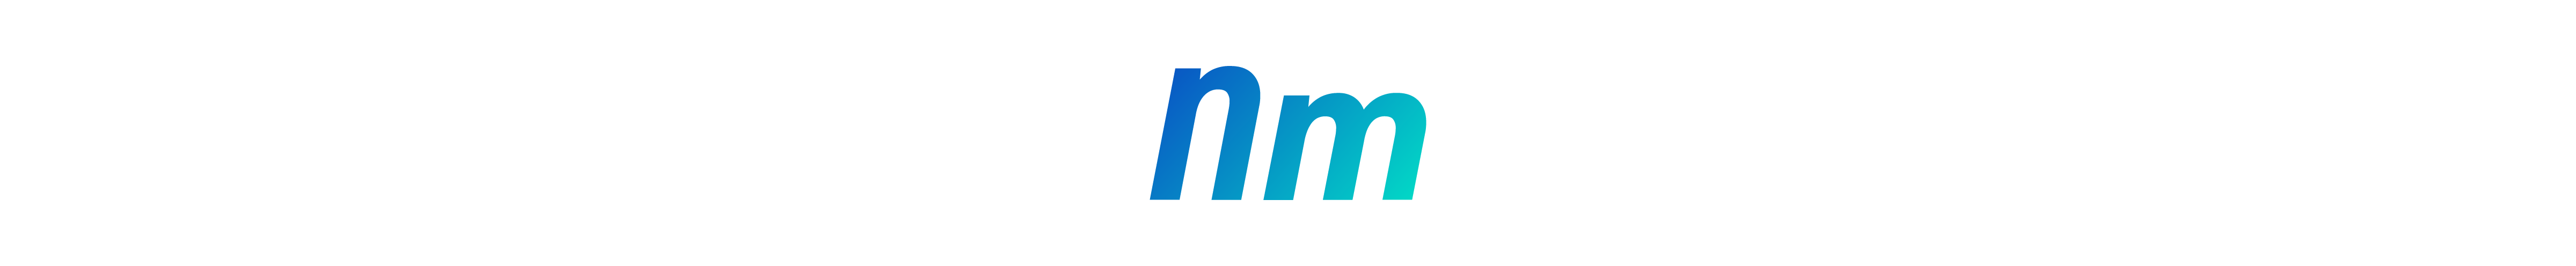 netmath logo